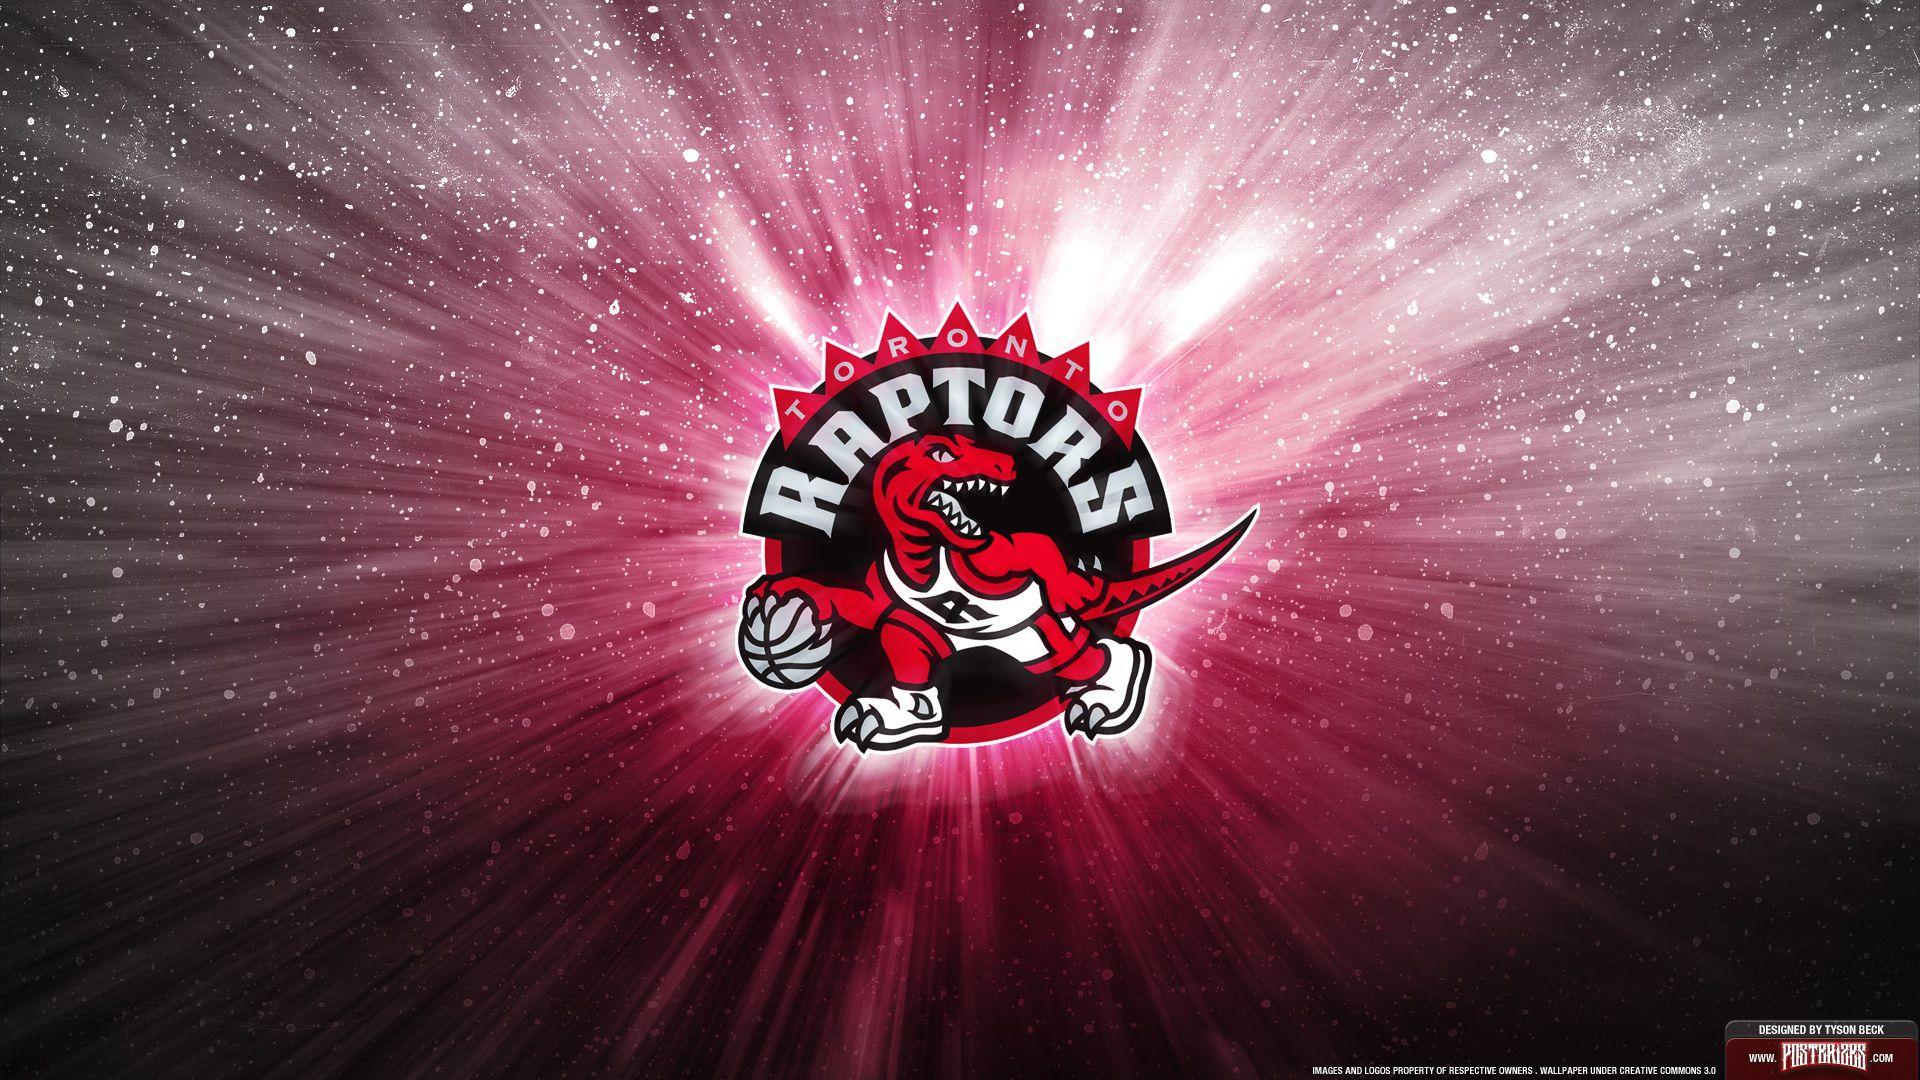 Toronto Sports Wallpaper Toronto Raptors Raptors Wallpaper Raptors